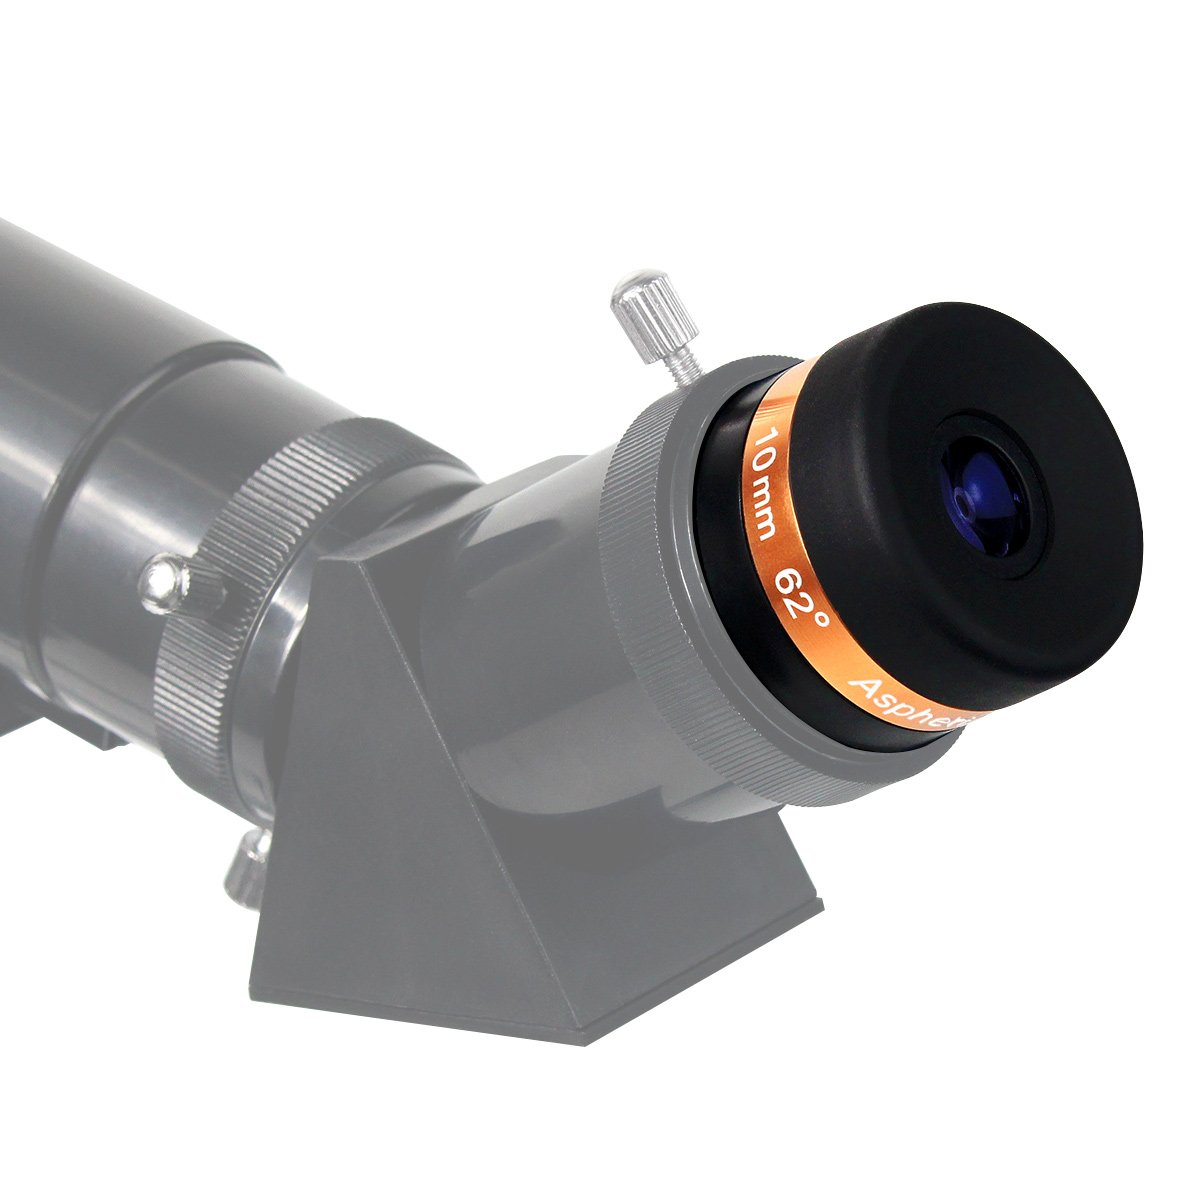 0a8e11b966be4 Svbony Ocular Telescopio con Angulo de 62 ° Aspheric Ocular con Recubierto  HD Completo